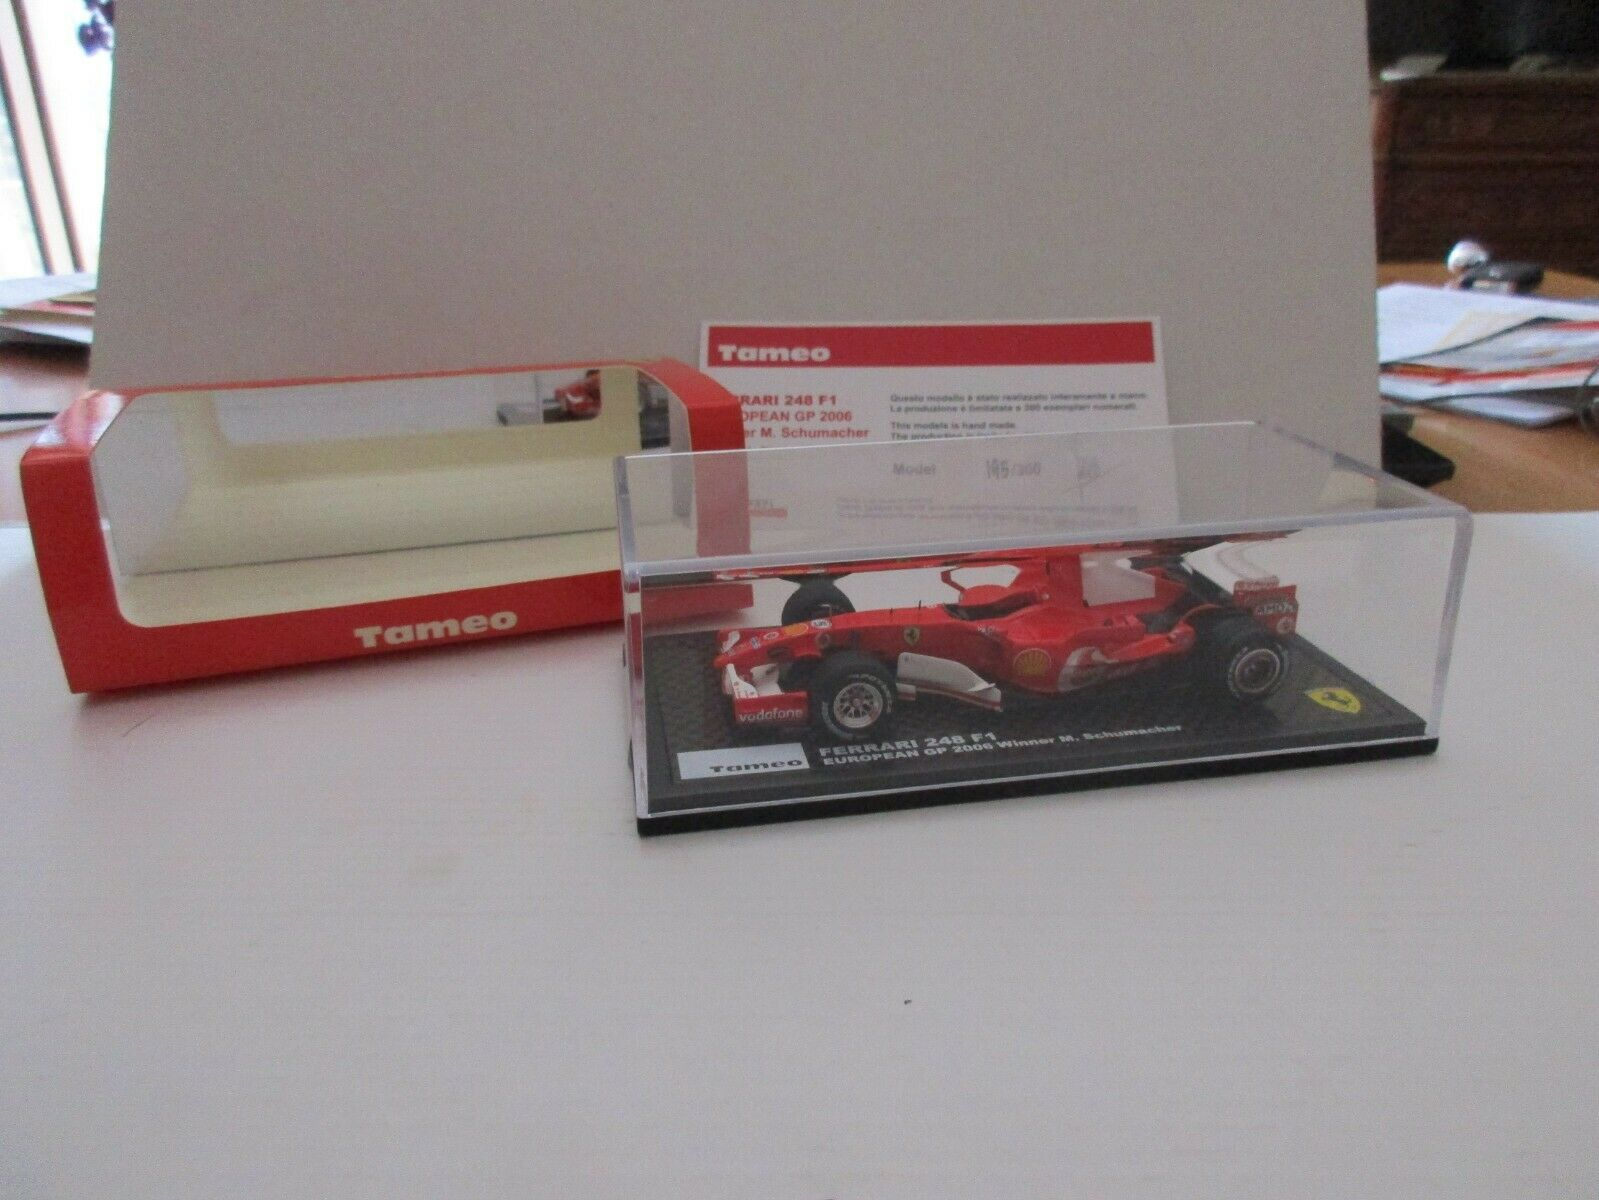 FERRARI 248 F1 EUROPEAN GP 2006  5 SCHUMACHER 1 43 TAMEO KITS TB003 BUILT MODEL